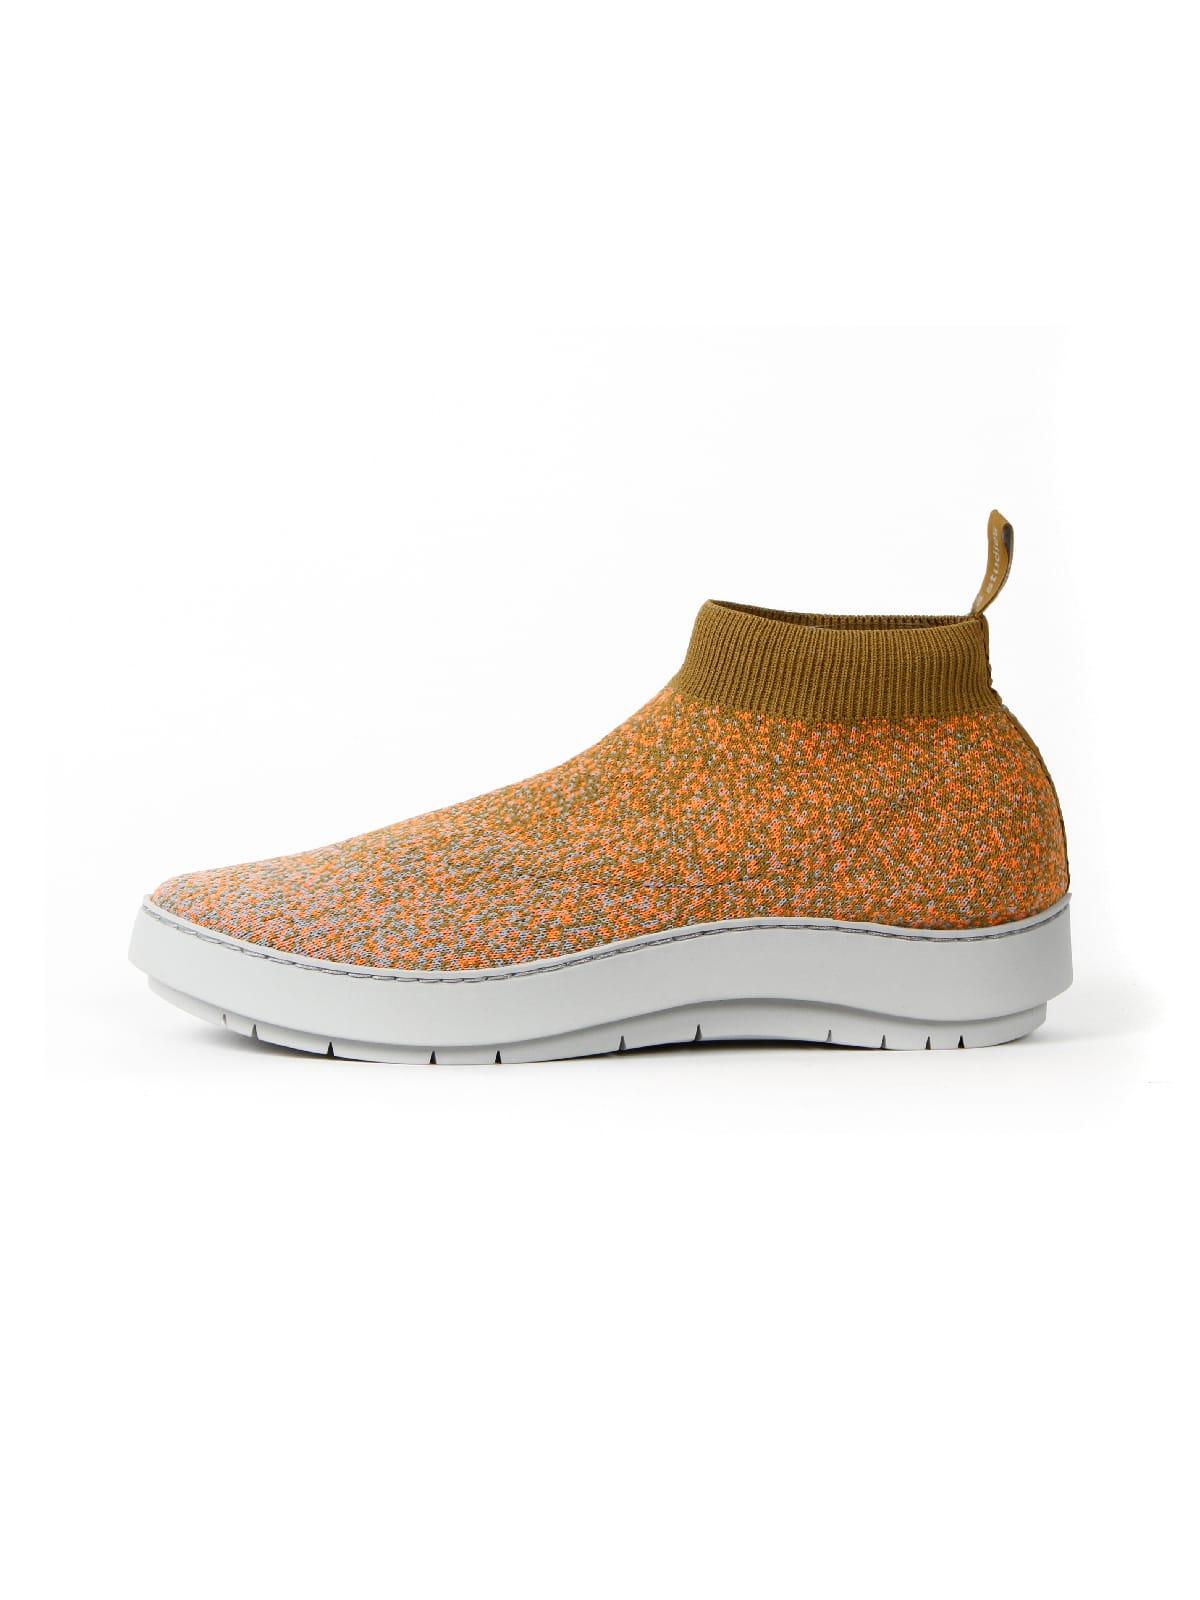 3D knitted sockboot Spexx papaya links